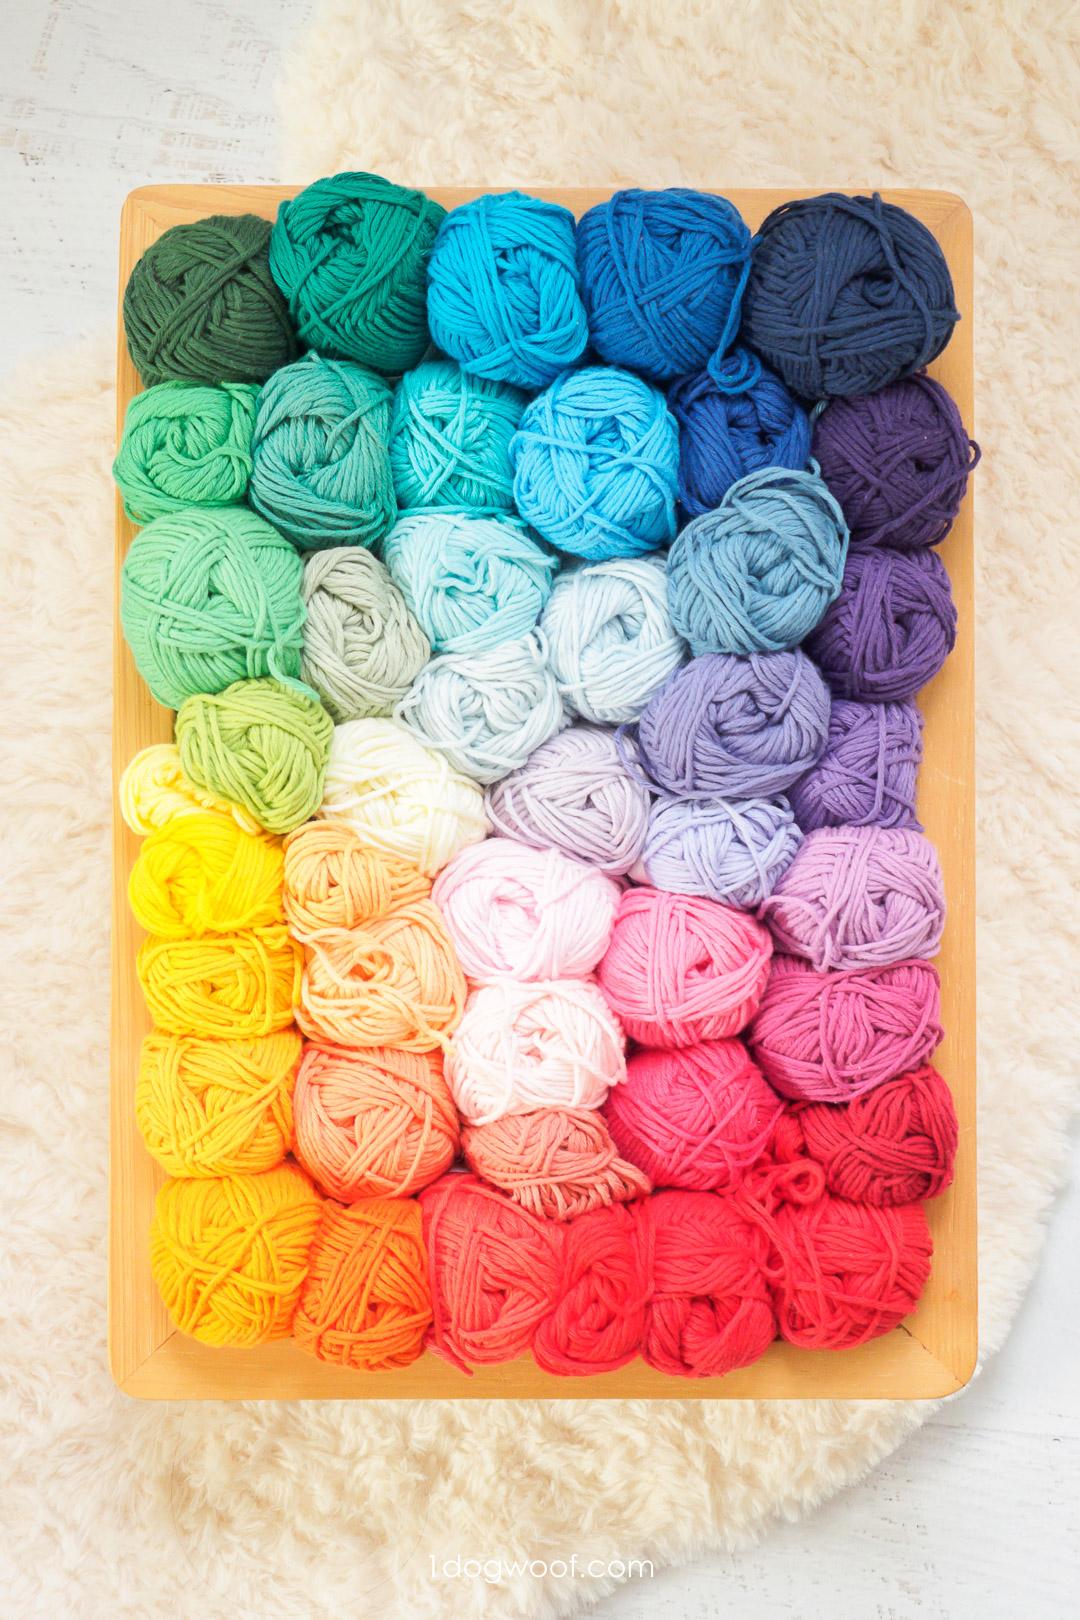 My Life in Yarn: The Design & Pattern Writing Process